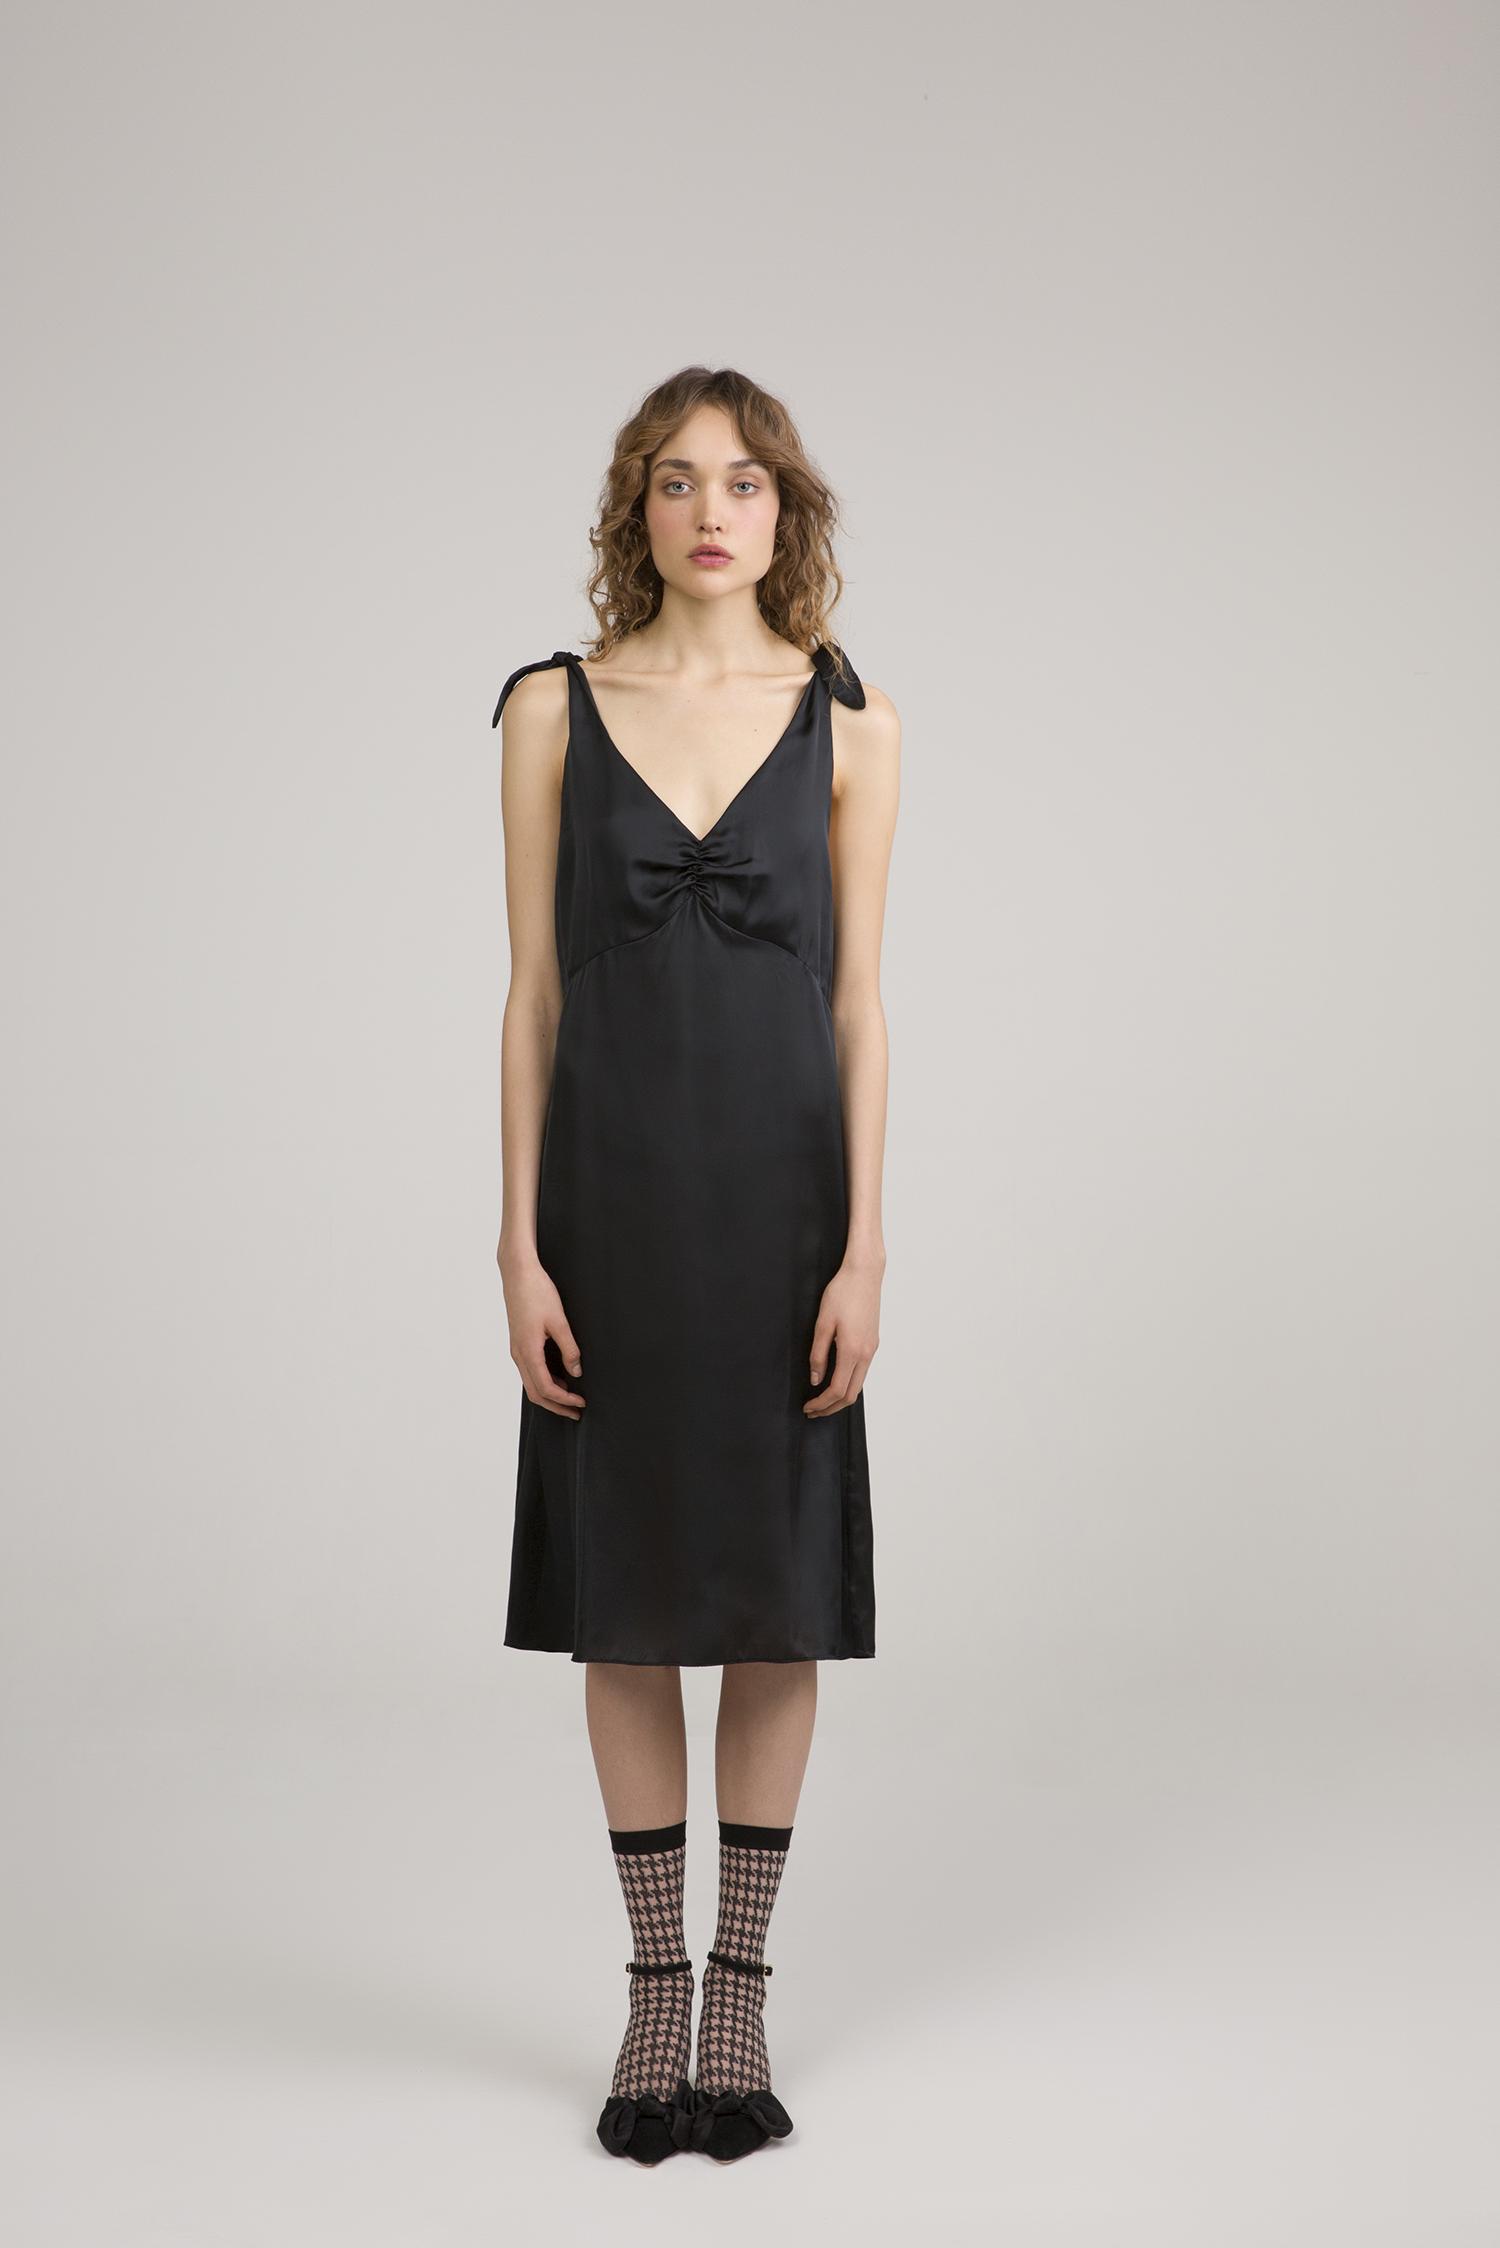 ESTHÉ - Black Satin Dress£115 GBP